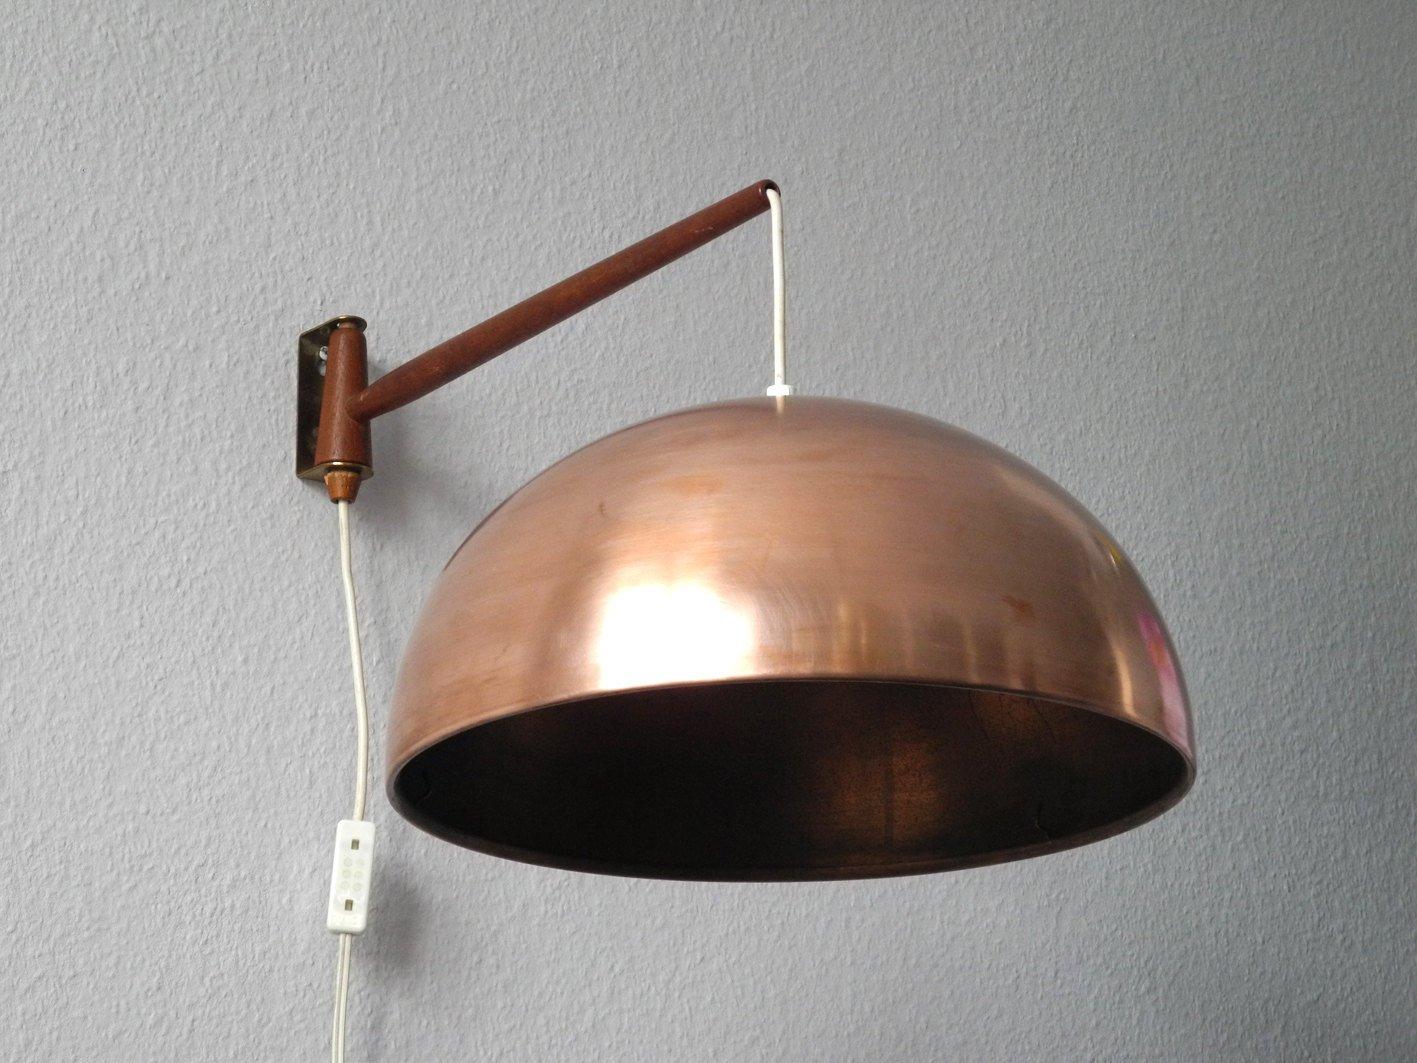 drehbare wandlampe aus teak messing mit lampenschirm aus. Black Bedroom Furniture Sets. Home Design Ideas